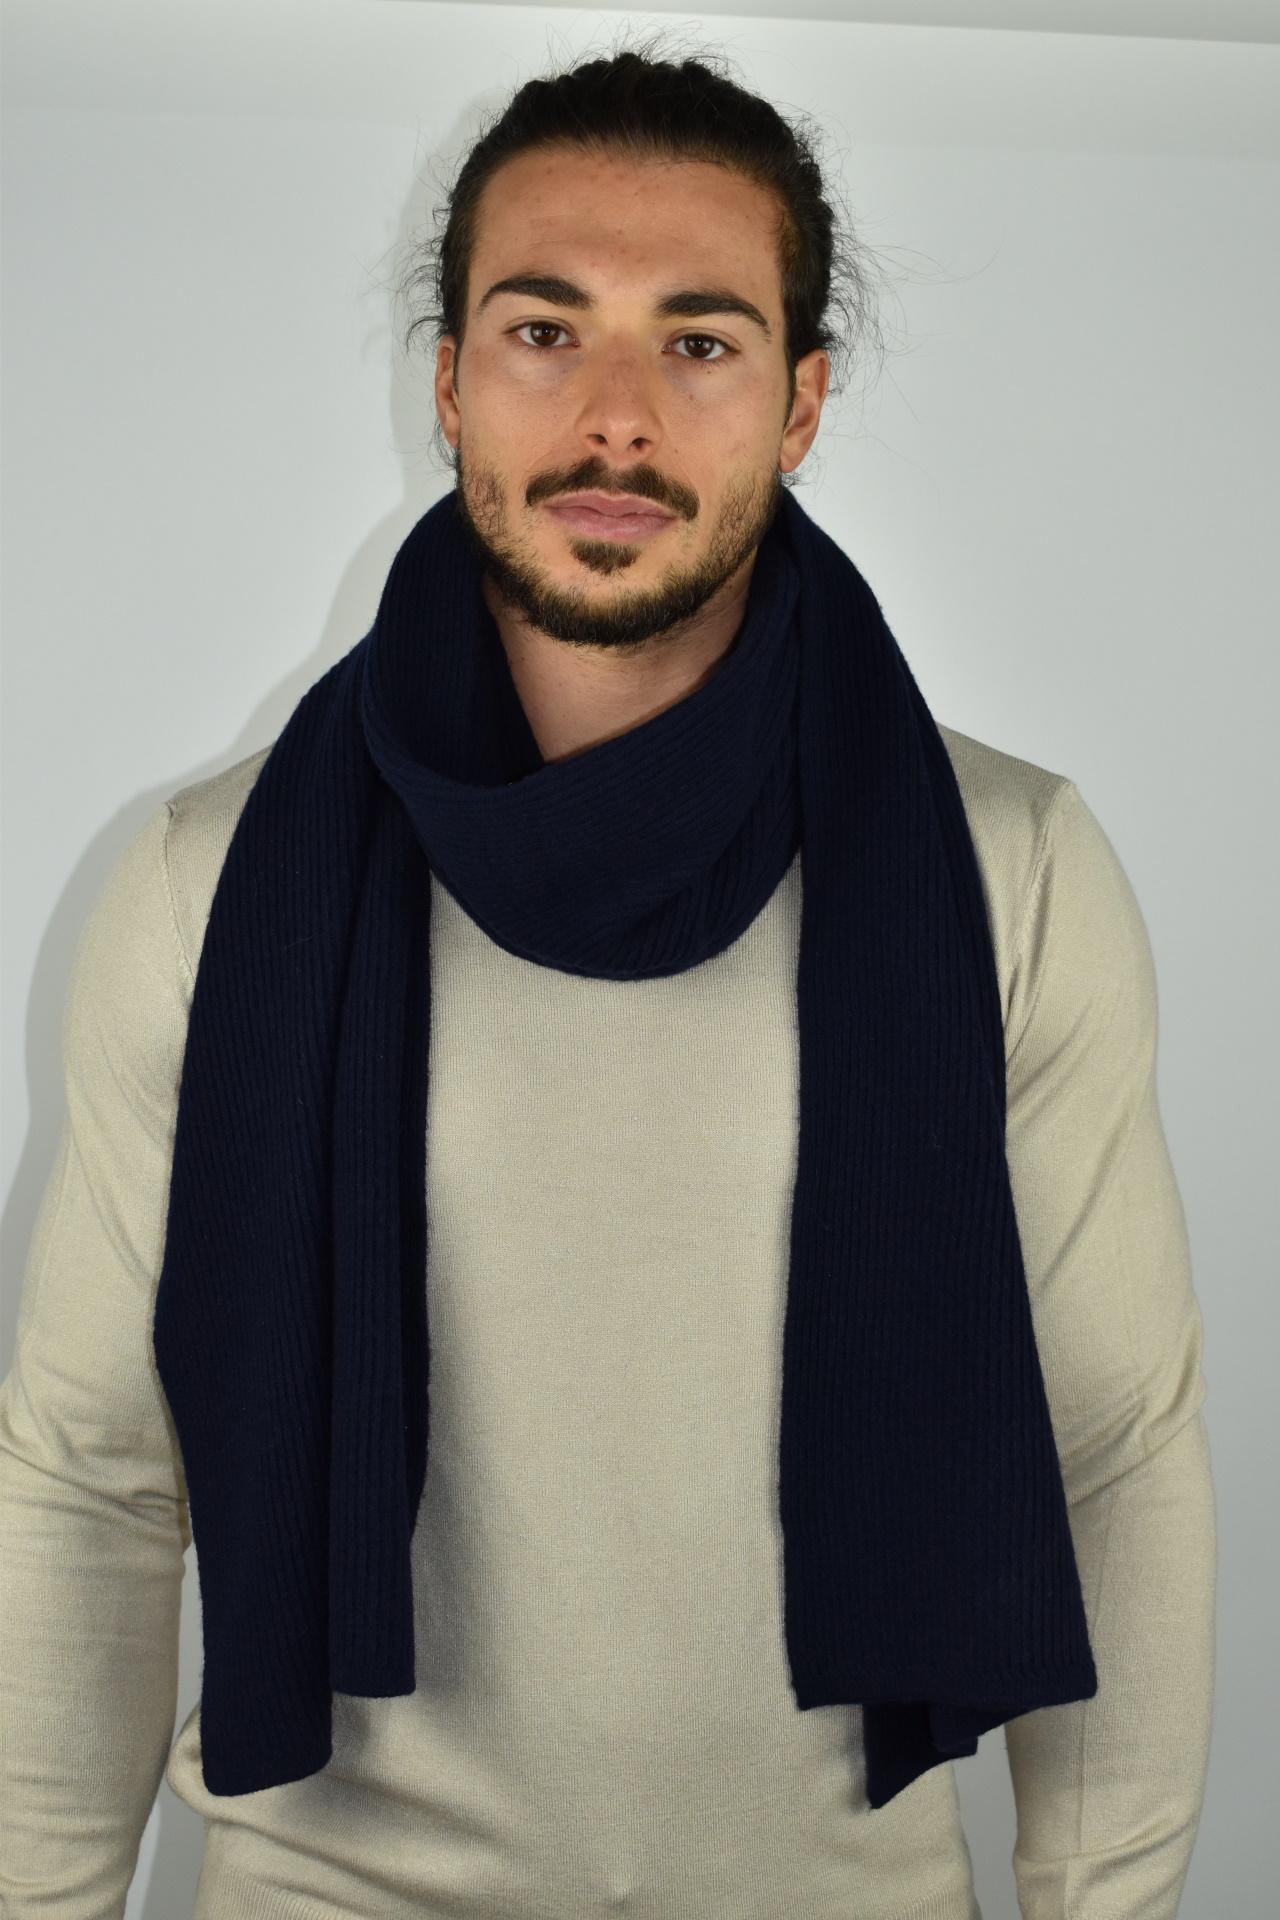 JURIDARIO NAVY SCIARPA UOMO 100 PURO CASHMERE COSTE LARGHE 2 1stAmerican sciarpa da uomo 100% puro cashmere Made in Italy a coste larghe - calda sciarpa invernale